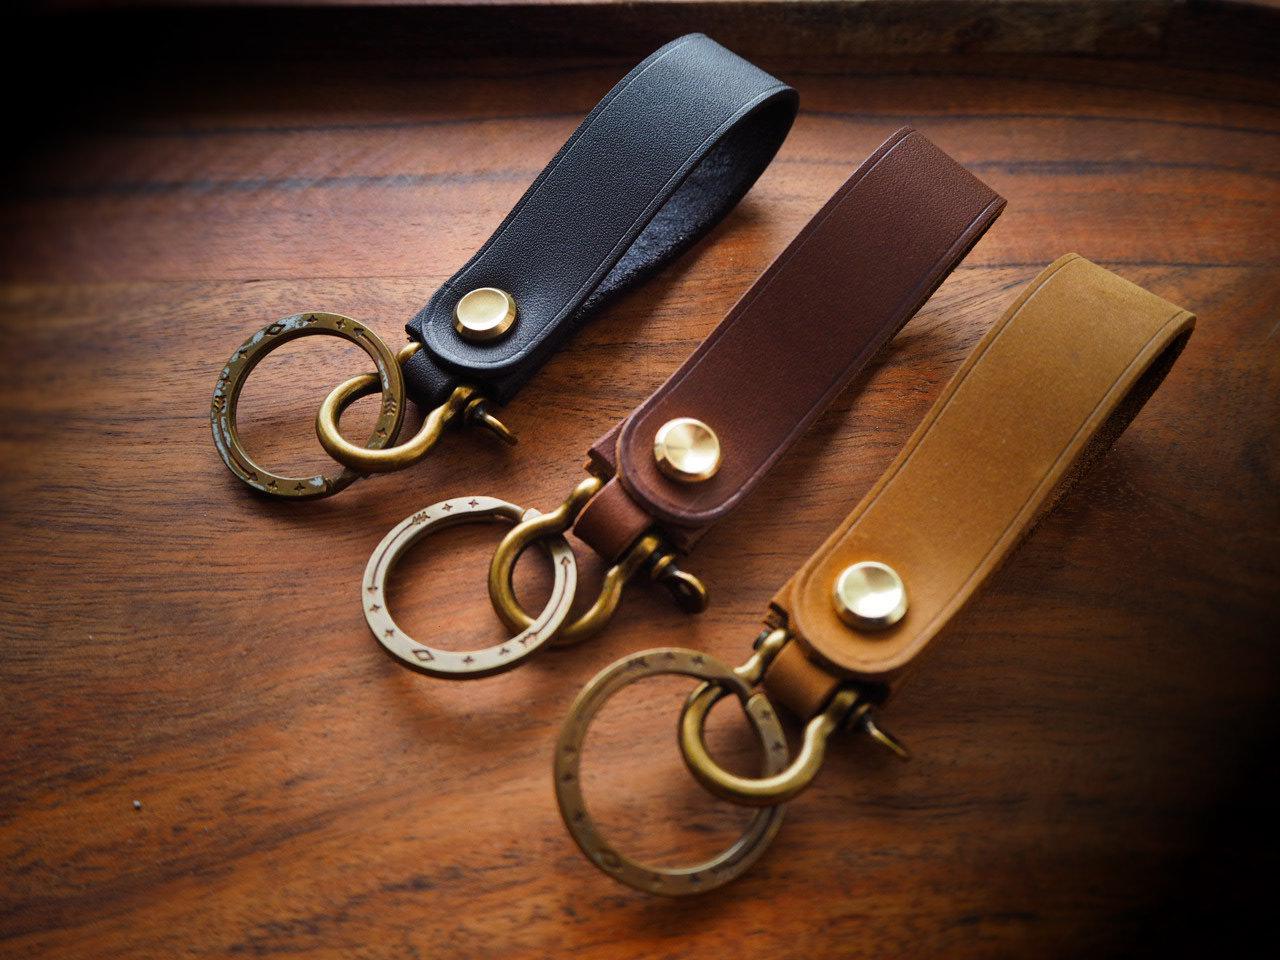 Key chain key ring cartridge upcycled quality  english leather